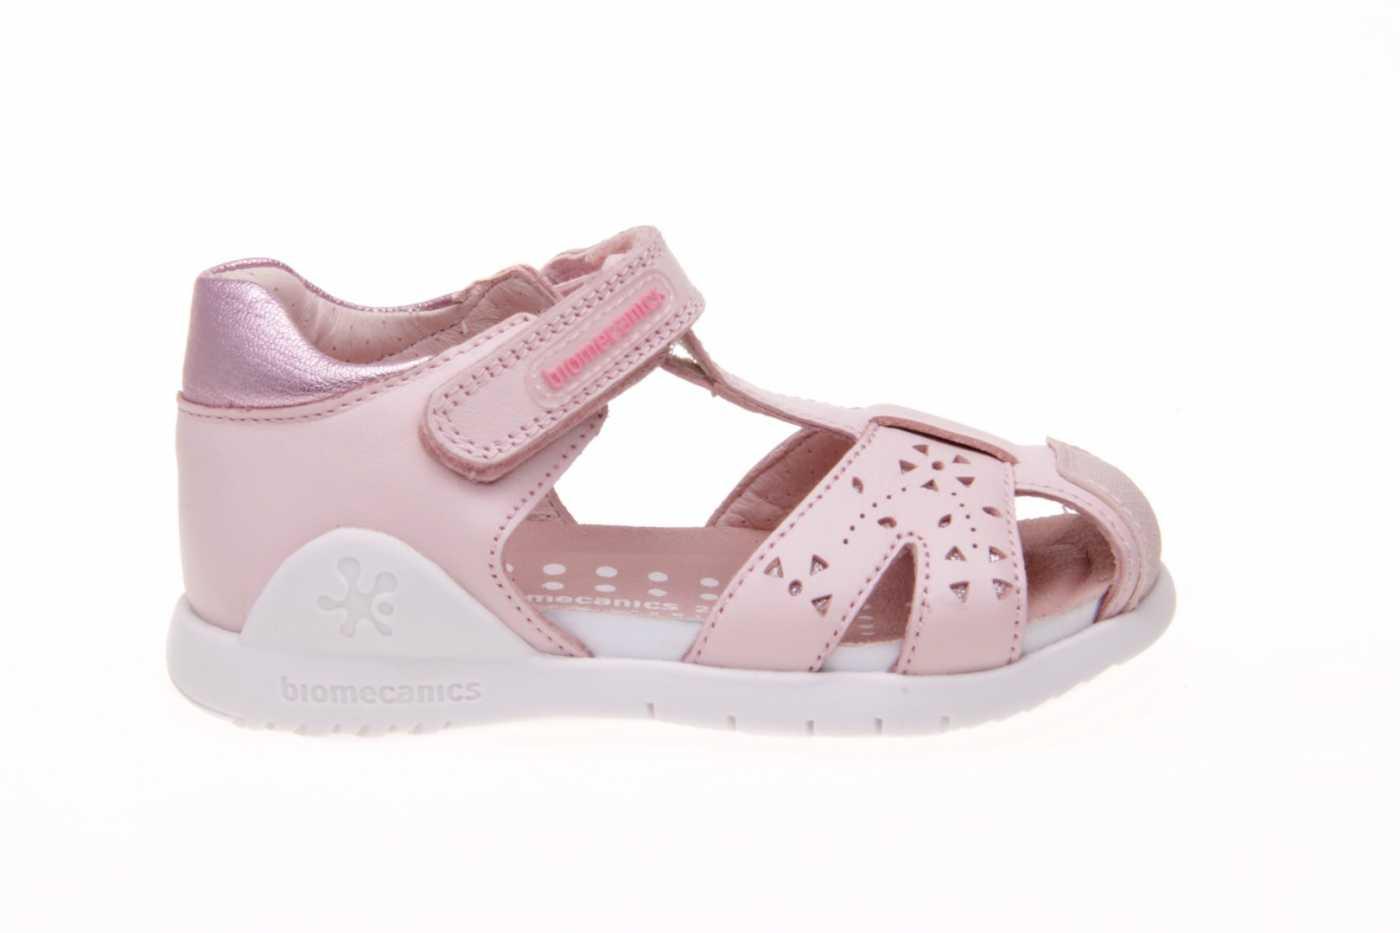 Napier Aplastar dañar  Comprar zapato BIOMECANICS para JOVEN NIÑA estilo SANDALIA color EMPOLVADO  PIEL